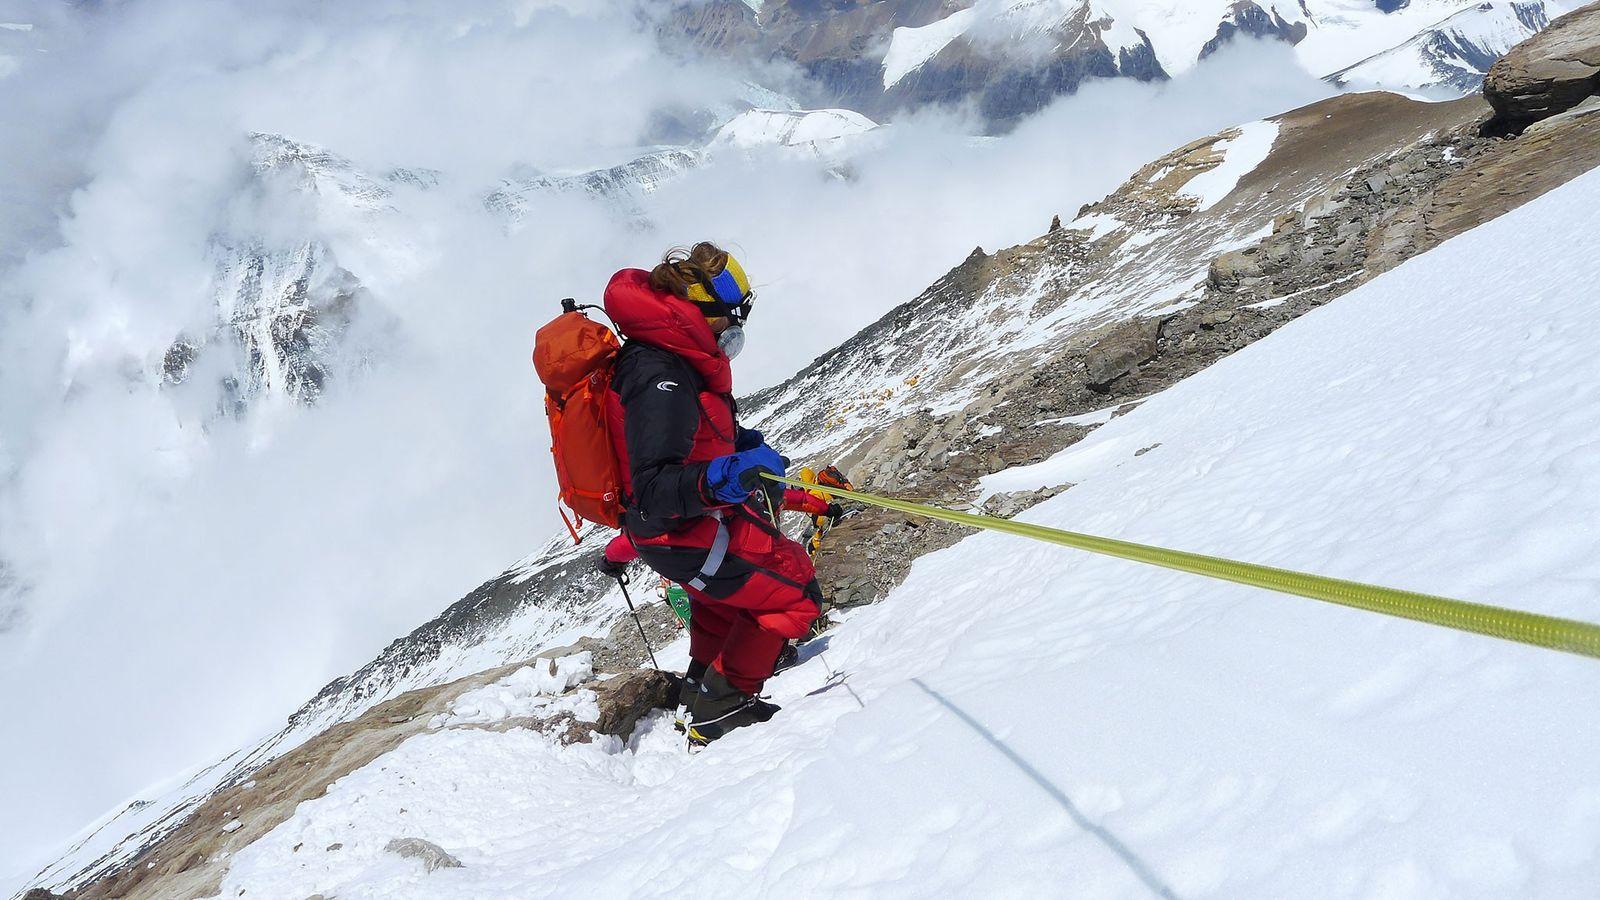 Andy-Holzer-alpinista-cego-monte-everest